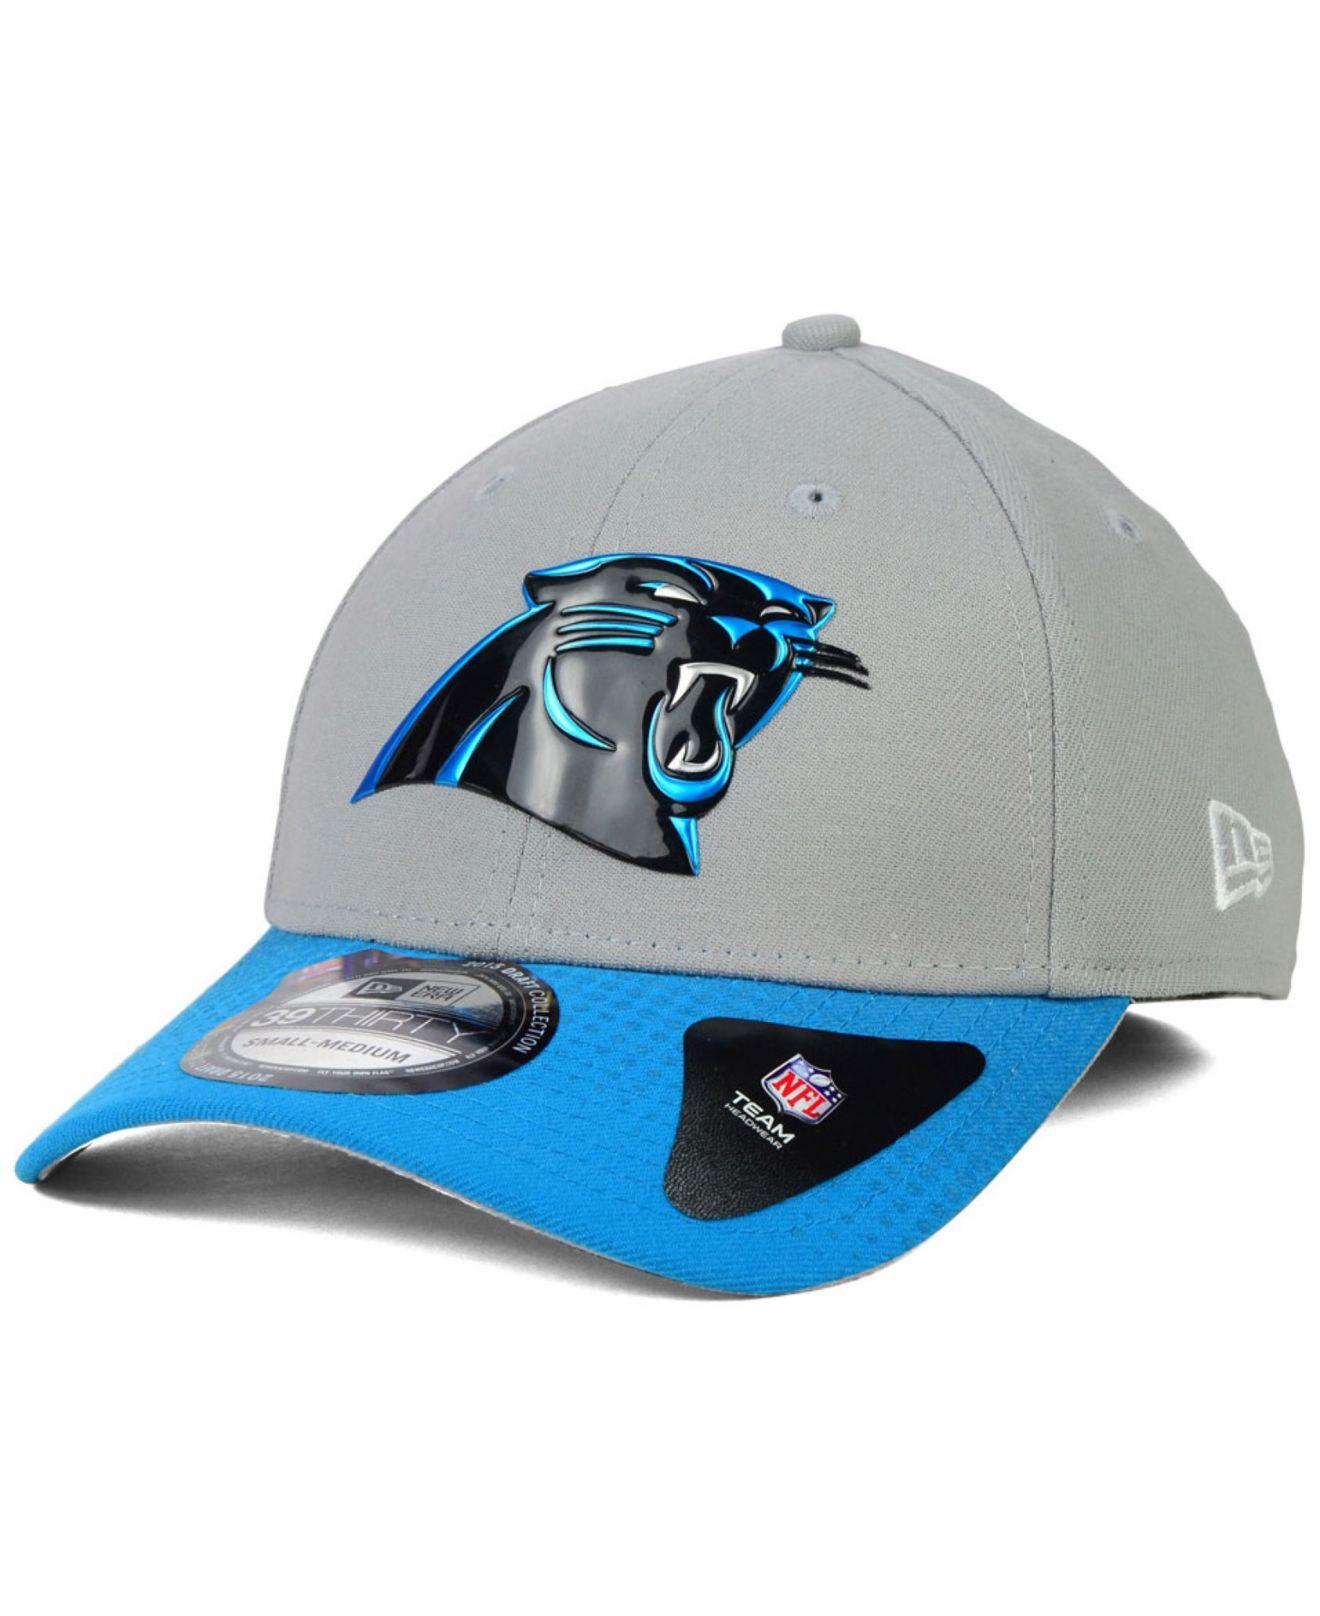 super popular c1e1b 8d86b ... cheap lyst ktz carolina panthers 2015 nfl draft 39thirty cap in gray  for men 5fc24 3b131